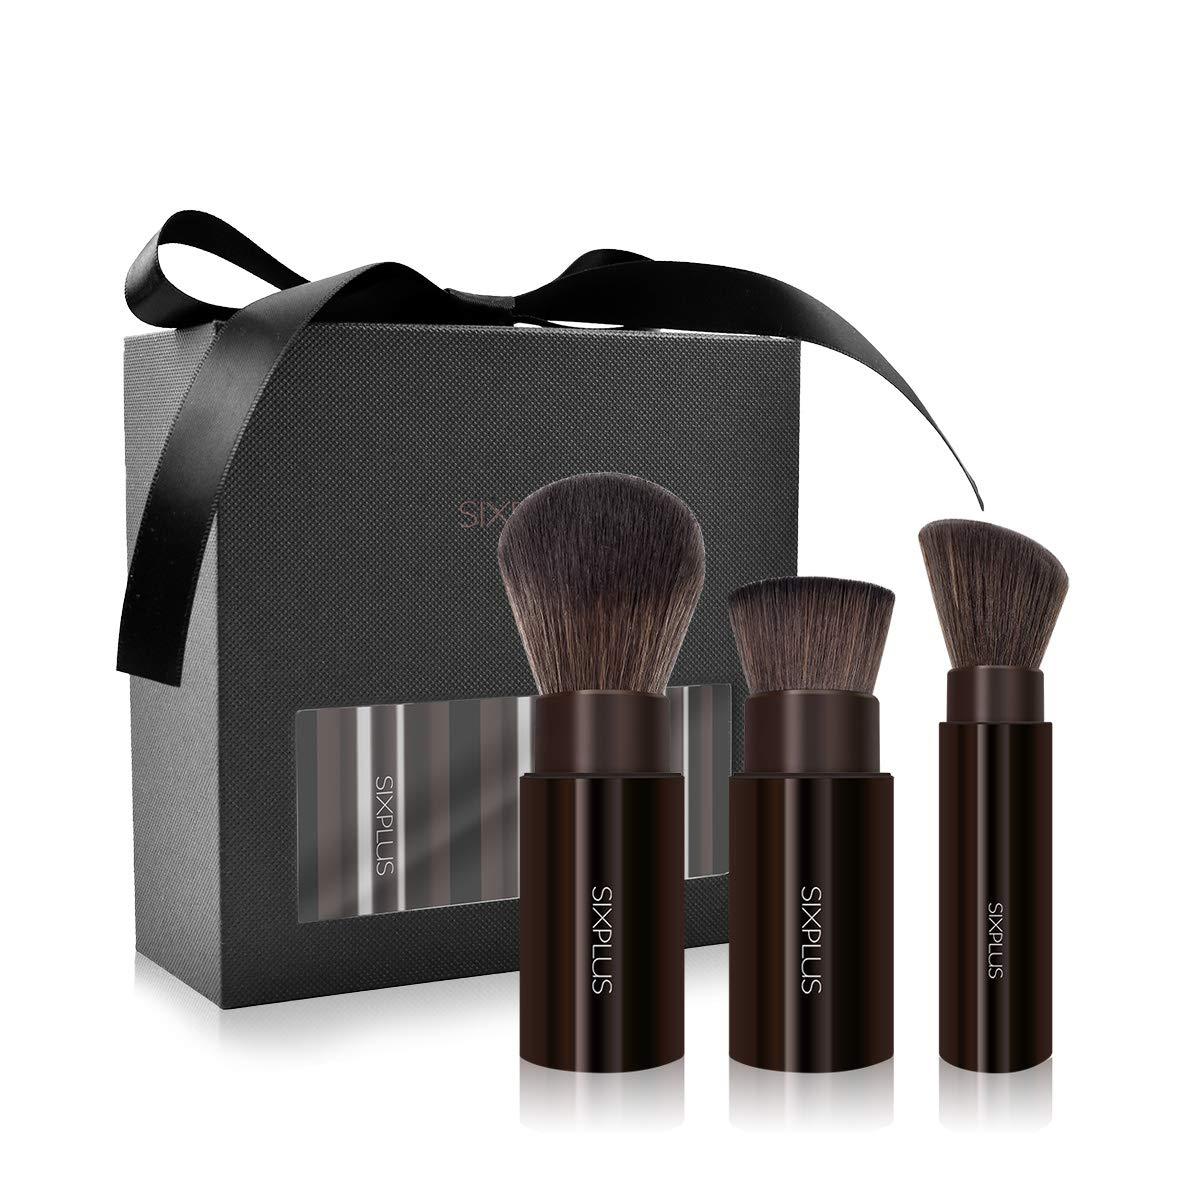 SIXPLUS 3Pcs Retractable and Portable Makeup Brush Set Premium Synthetic Makeup Brushes